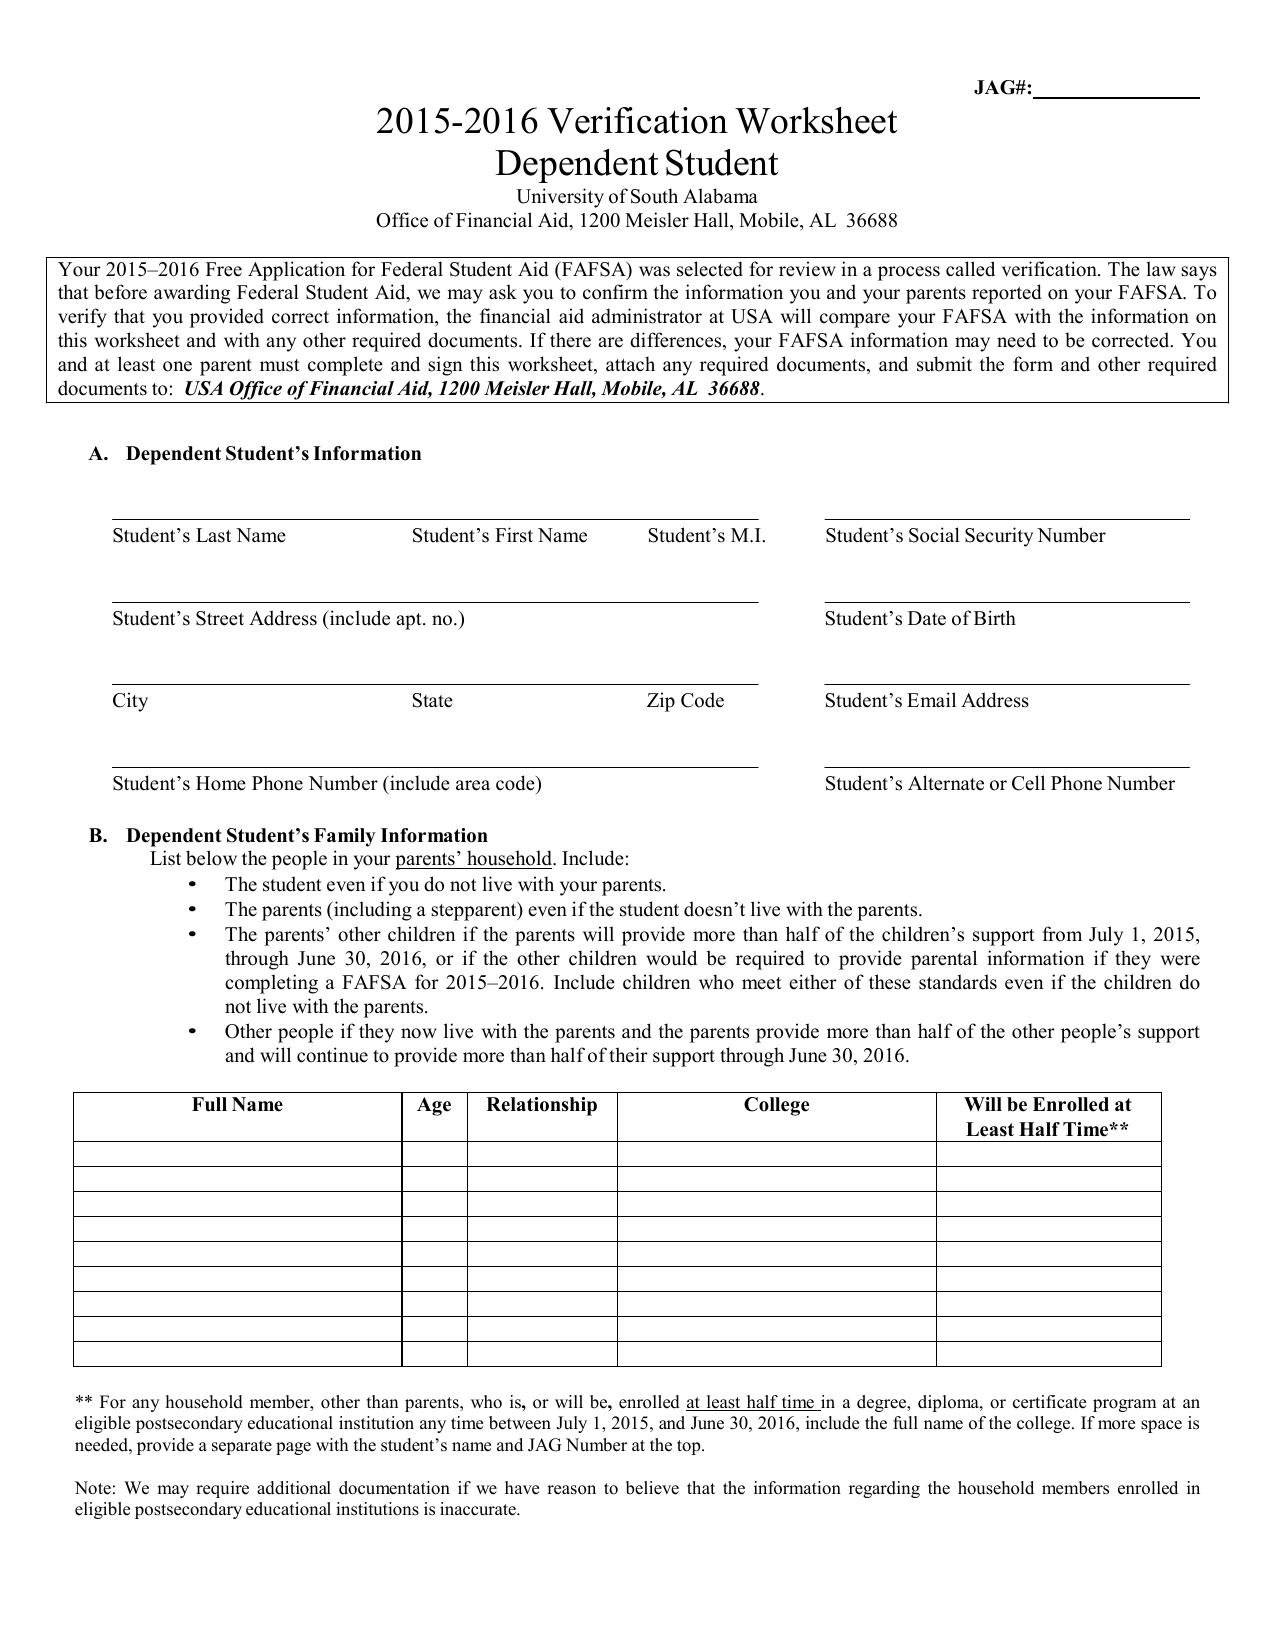 worksheet Verification Worksheet Dependent Student 2015 2016 verification worksheet dependent student